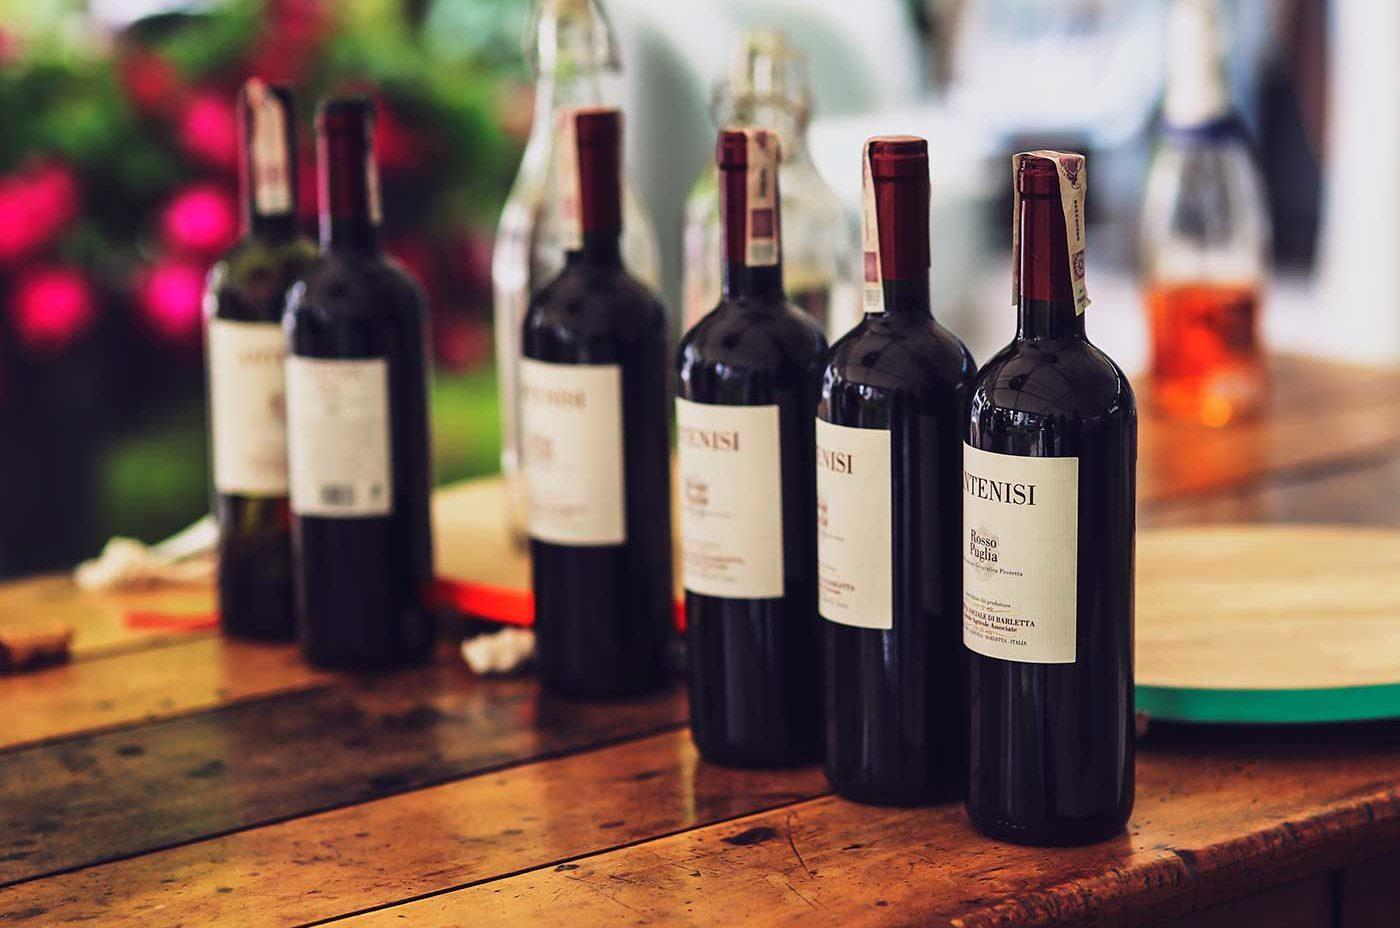 Calgary wine tasting